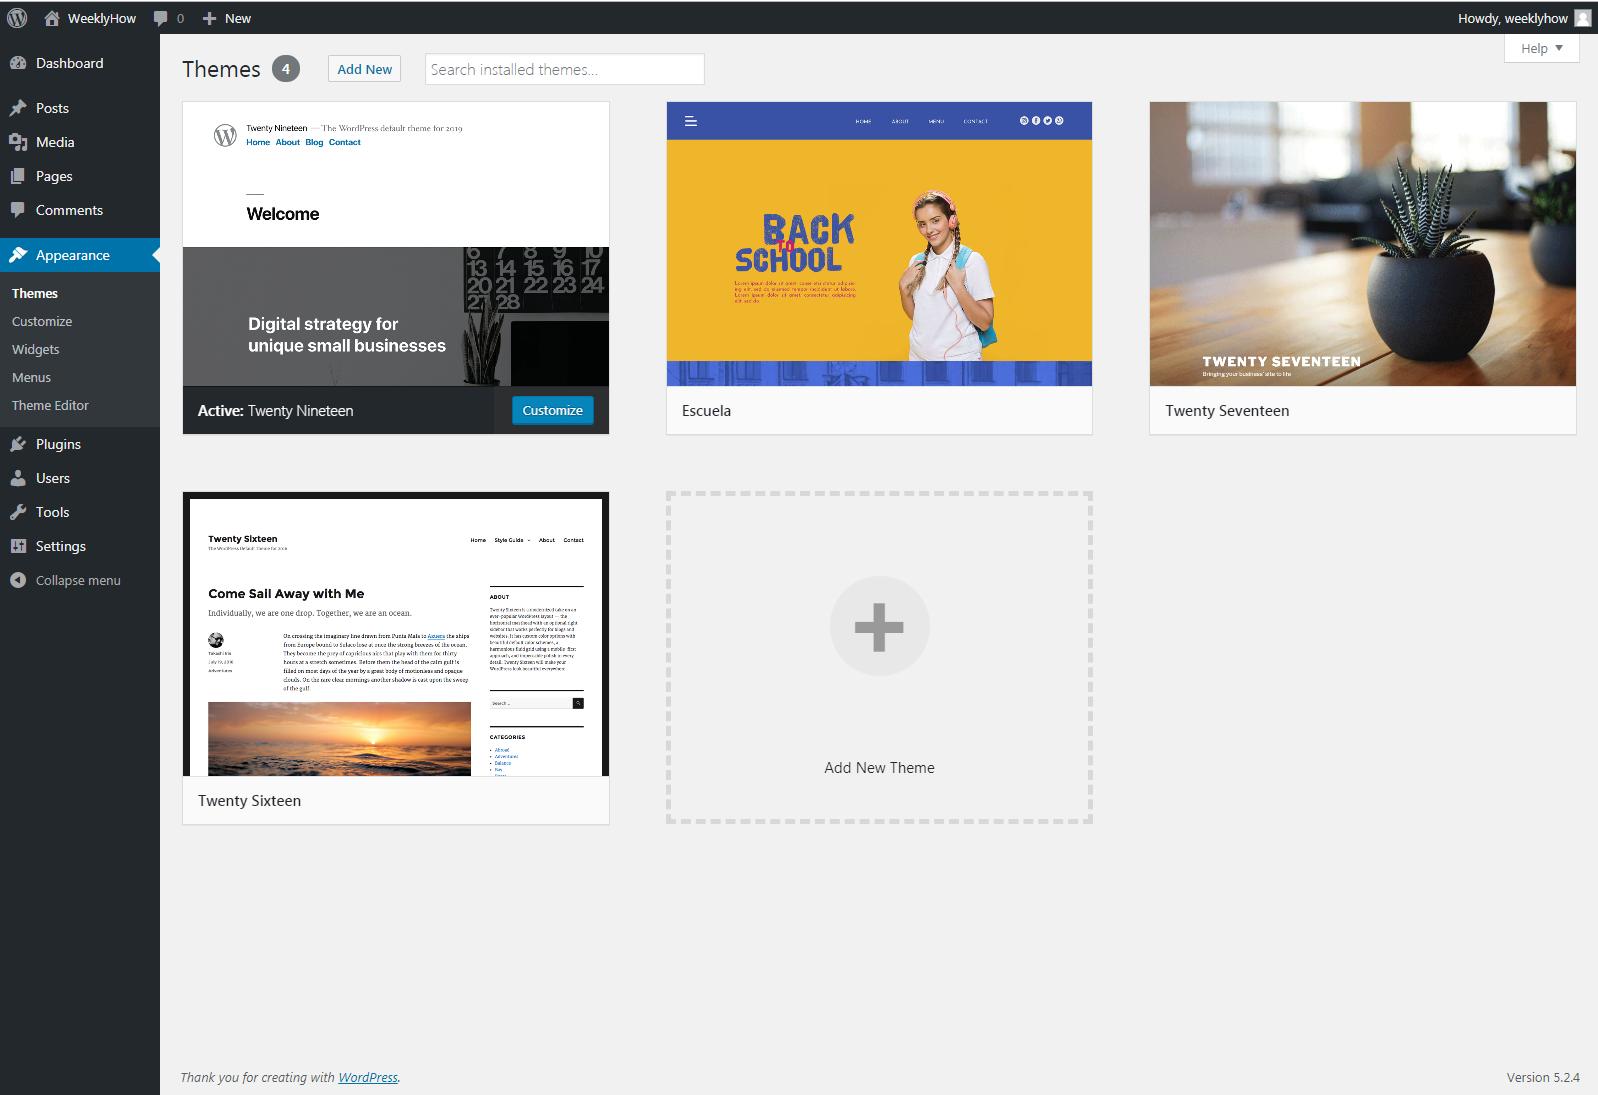 Developing Premium WordPress themes - Managing themes